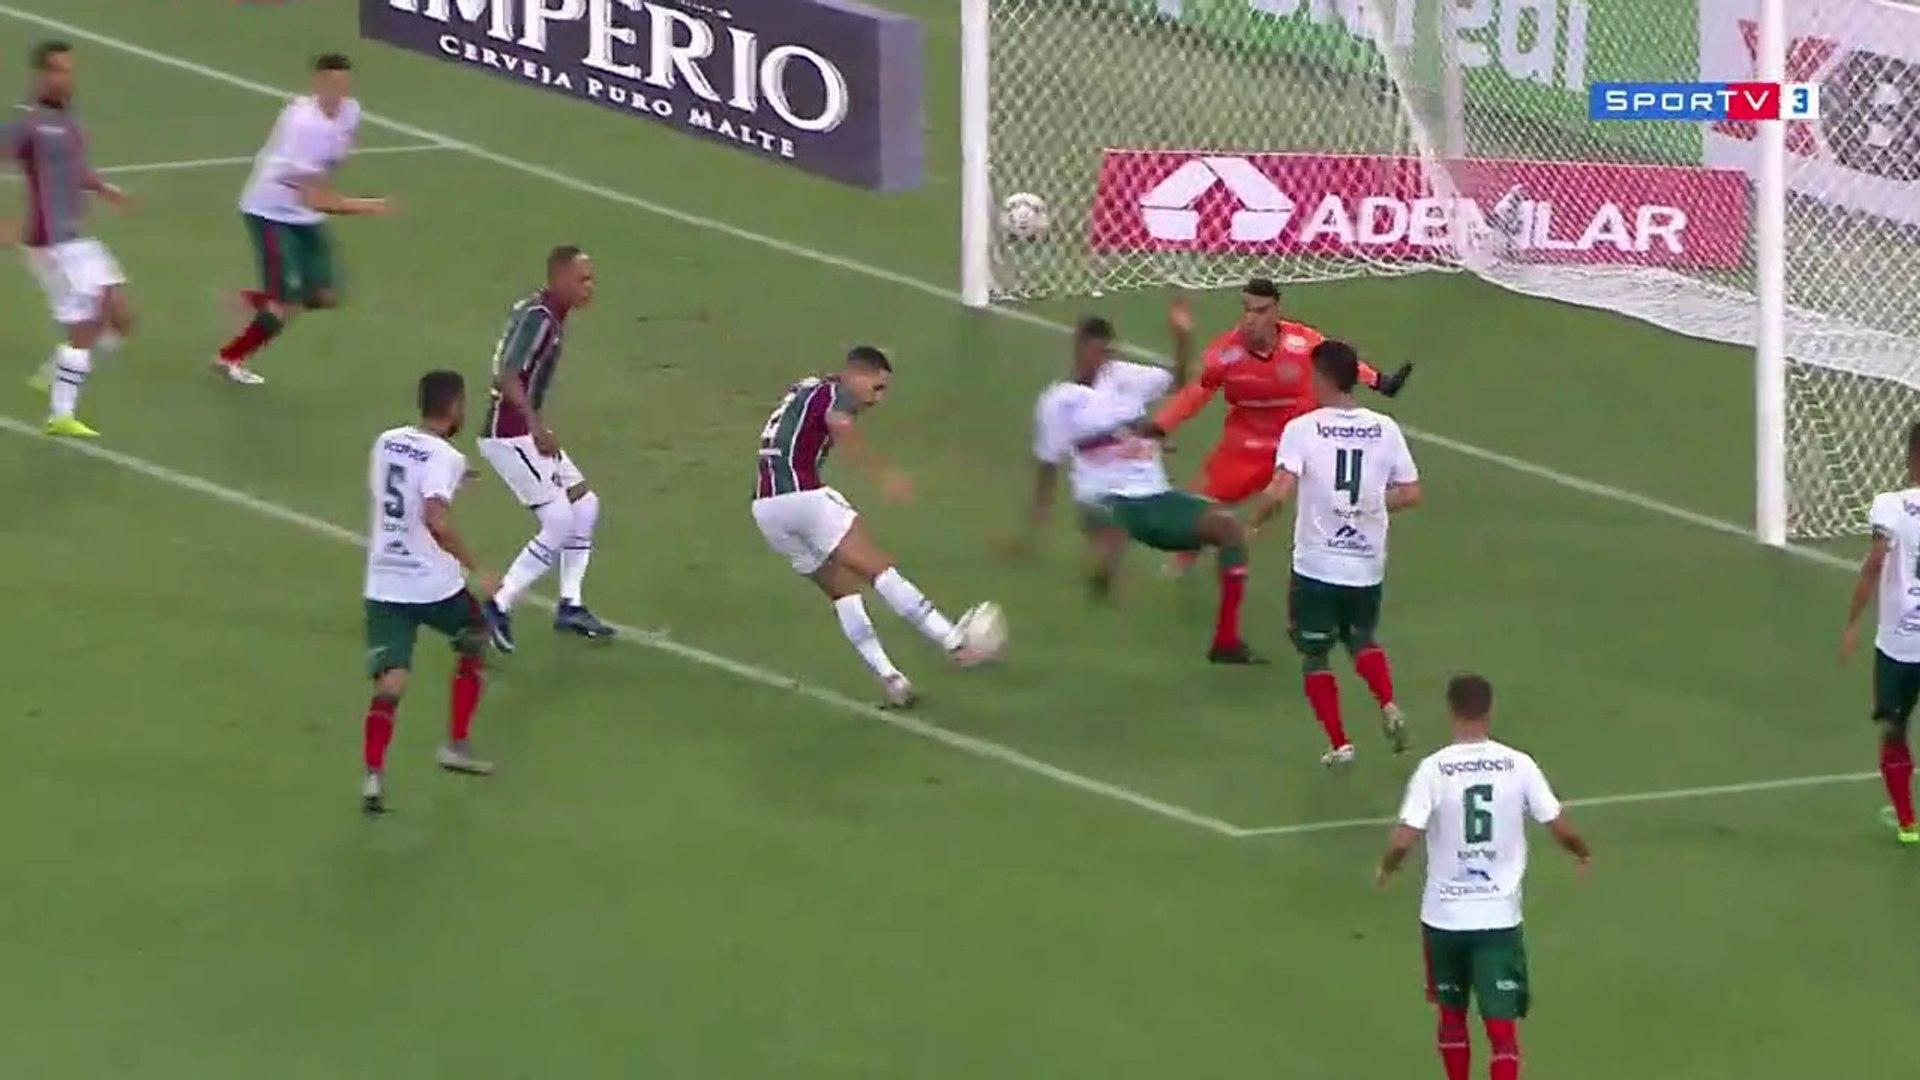 FLUMINENSE 2 x 0 Portuguesa - Carioca 2020